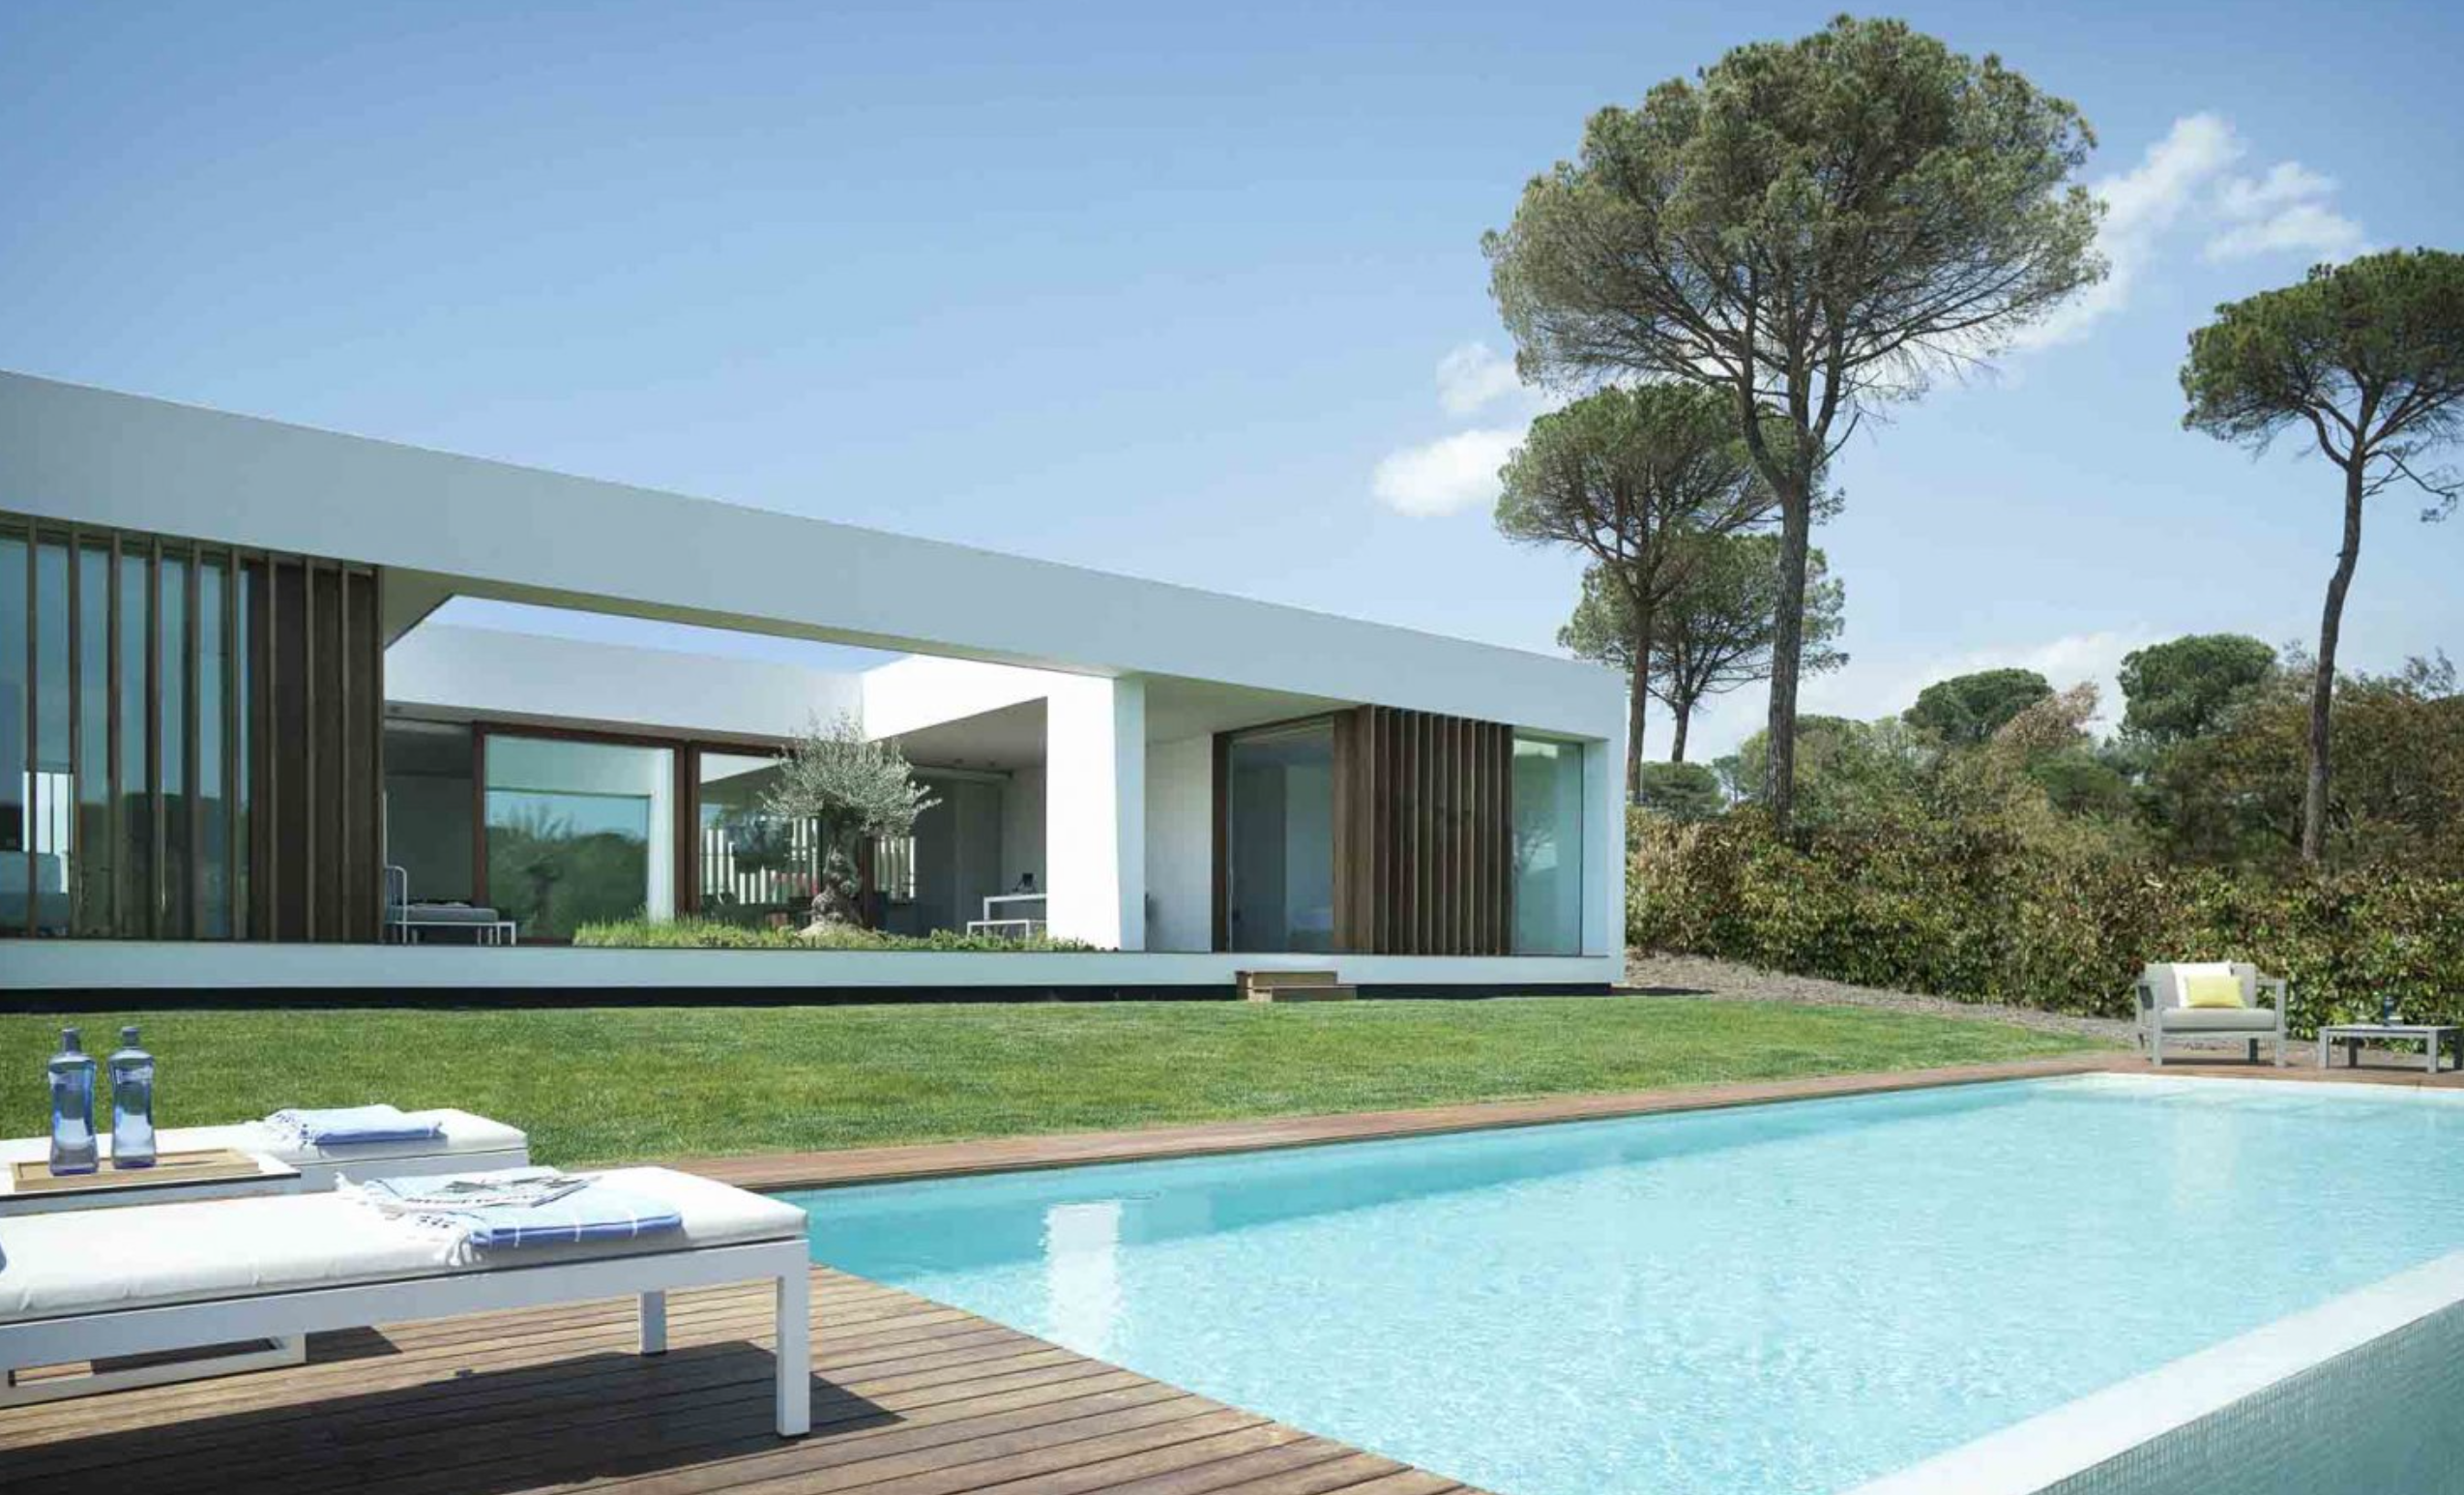 U Selva sale of luxury houses in Girona